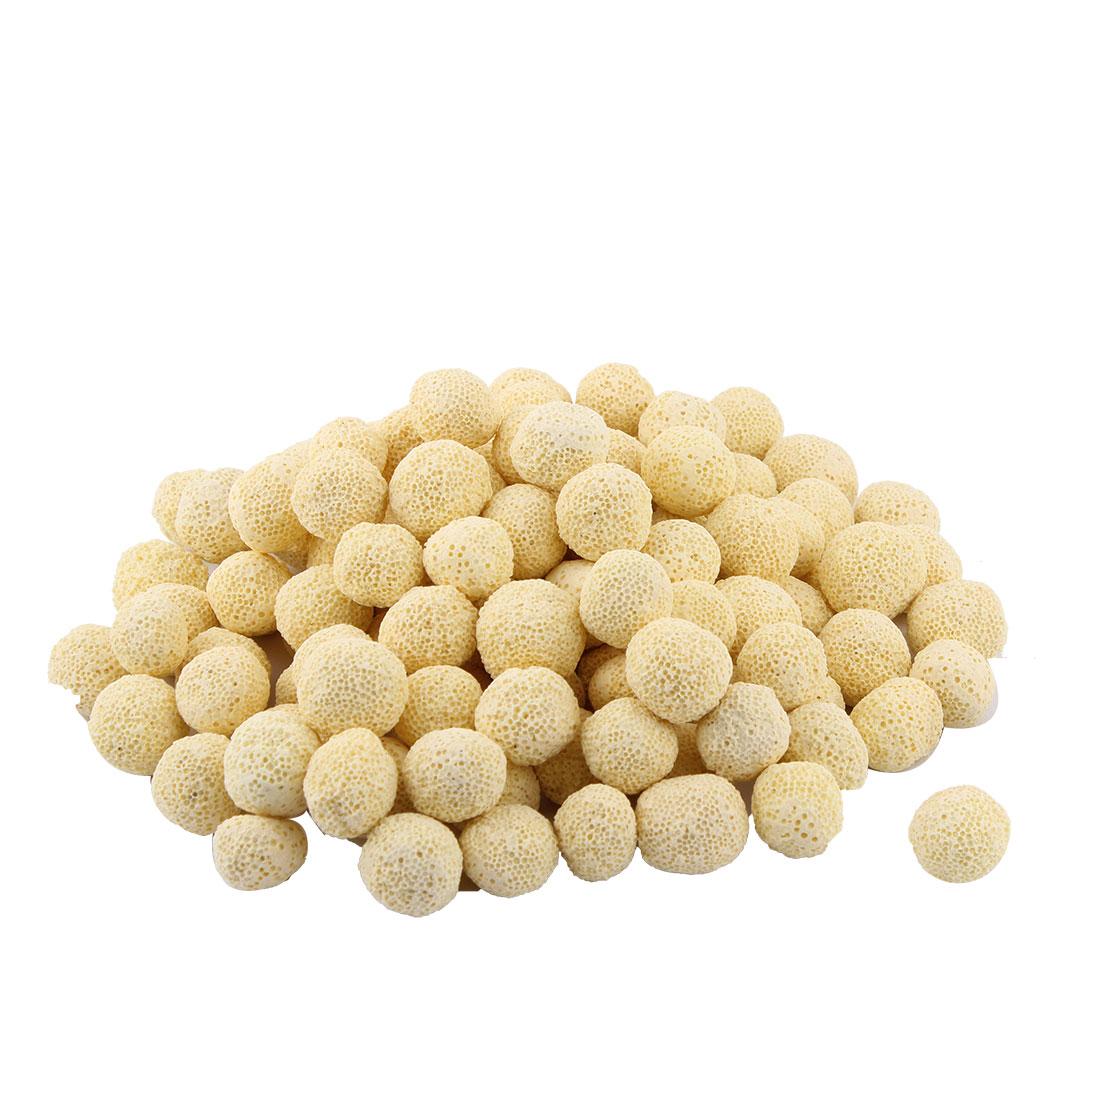 Aquarium Fish Tank Ceramic Round Biological Filter Balls Canister Yellow 124pcs